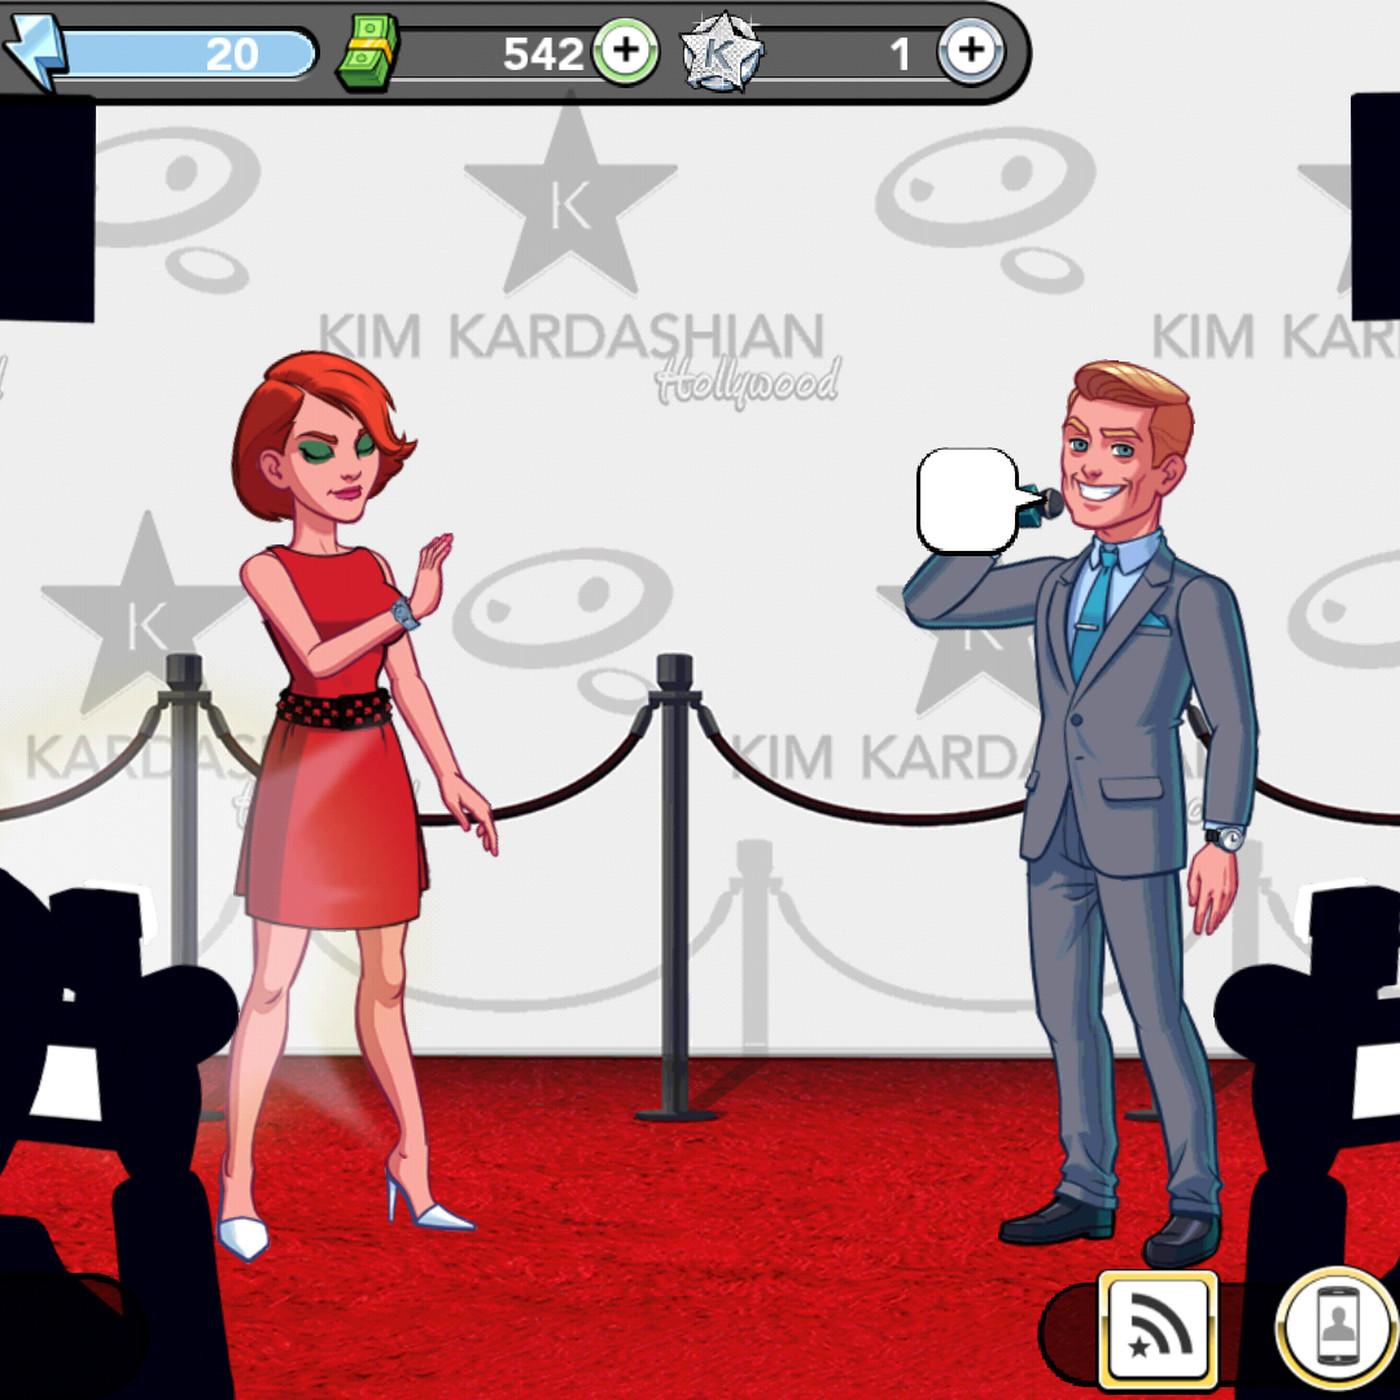 How to date cassio on kim kardashian hollywood